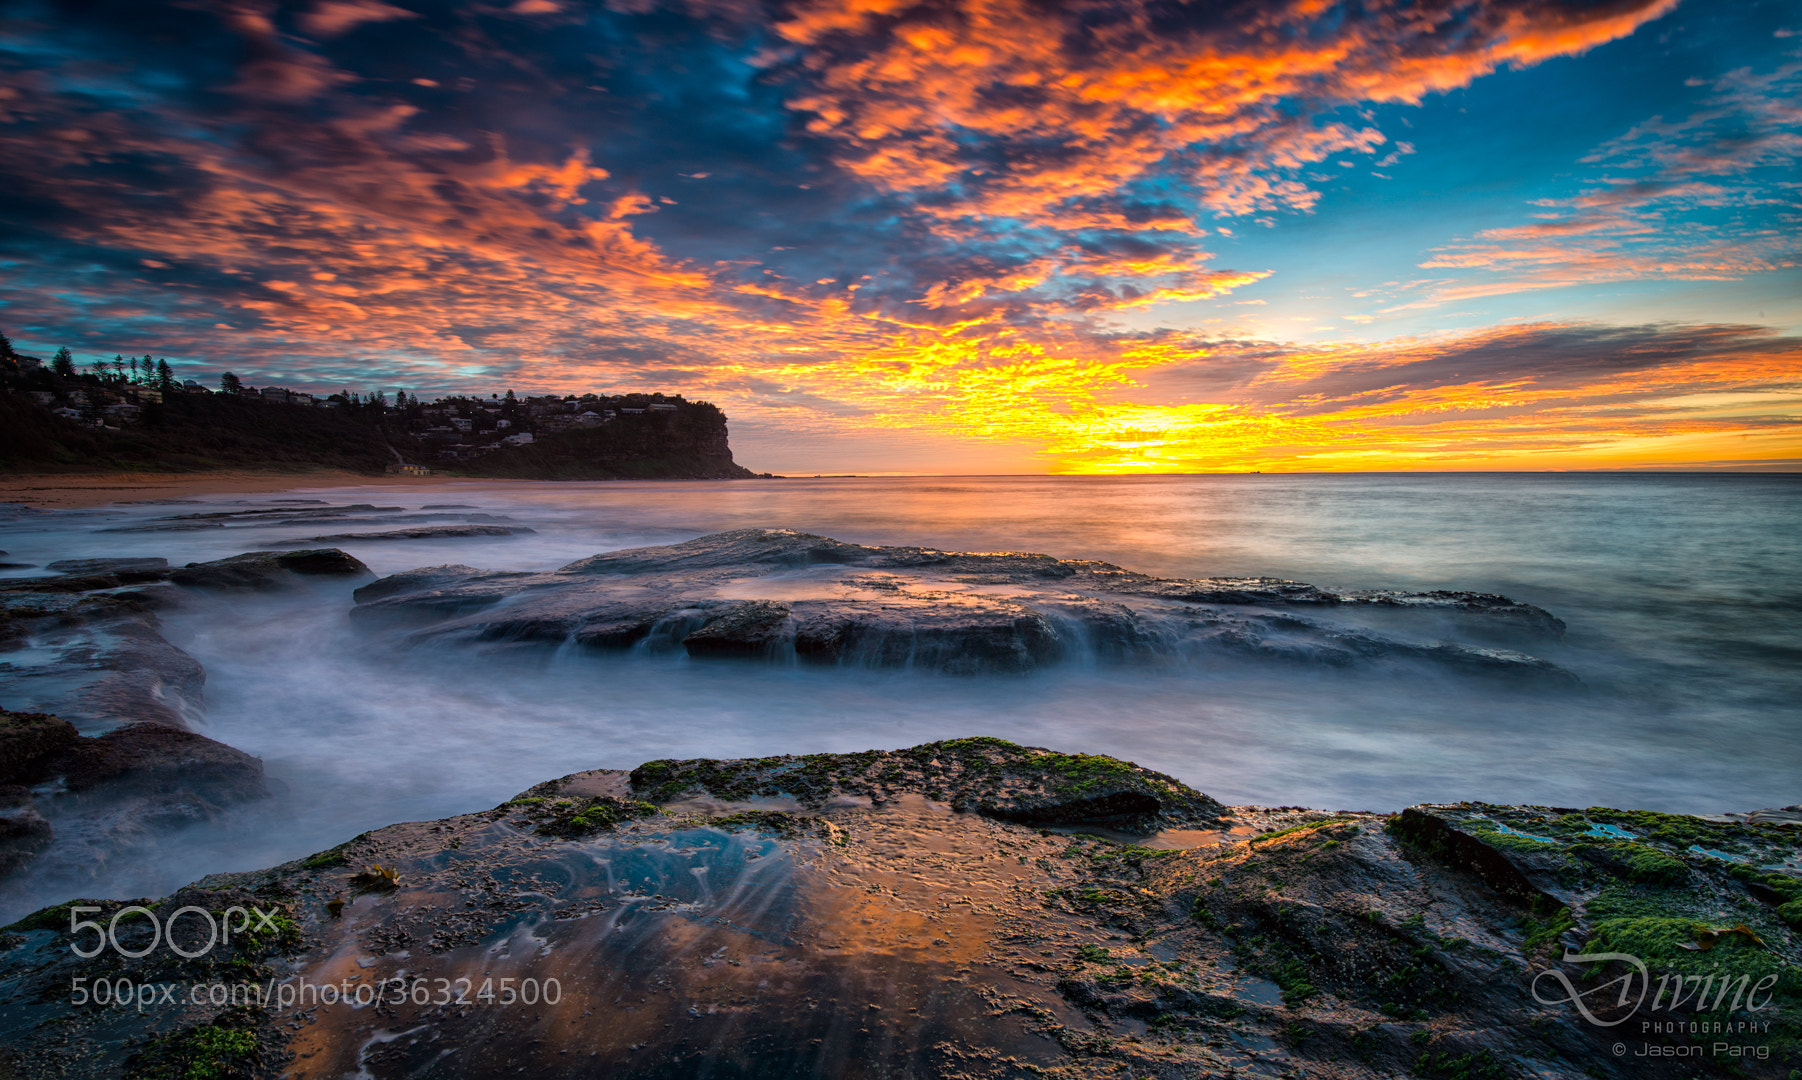 Photograph Morning Glory by Jason Pang on 500px